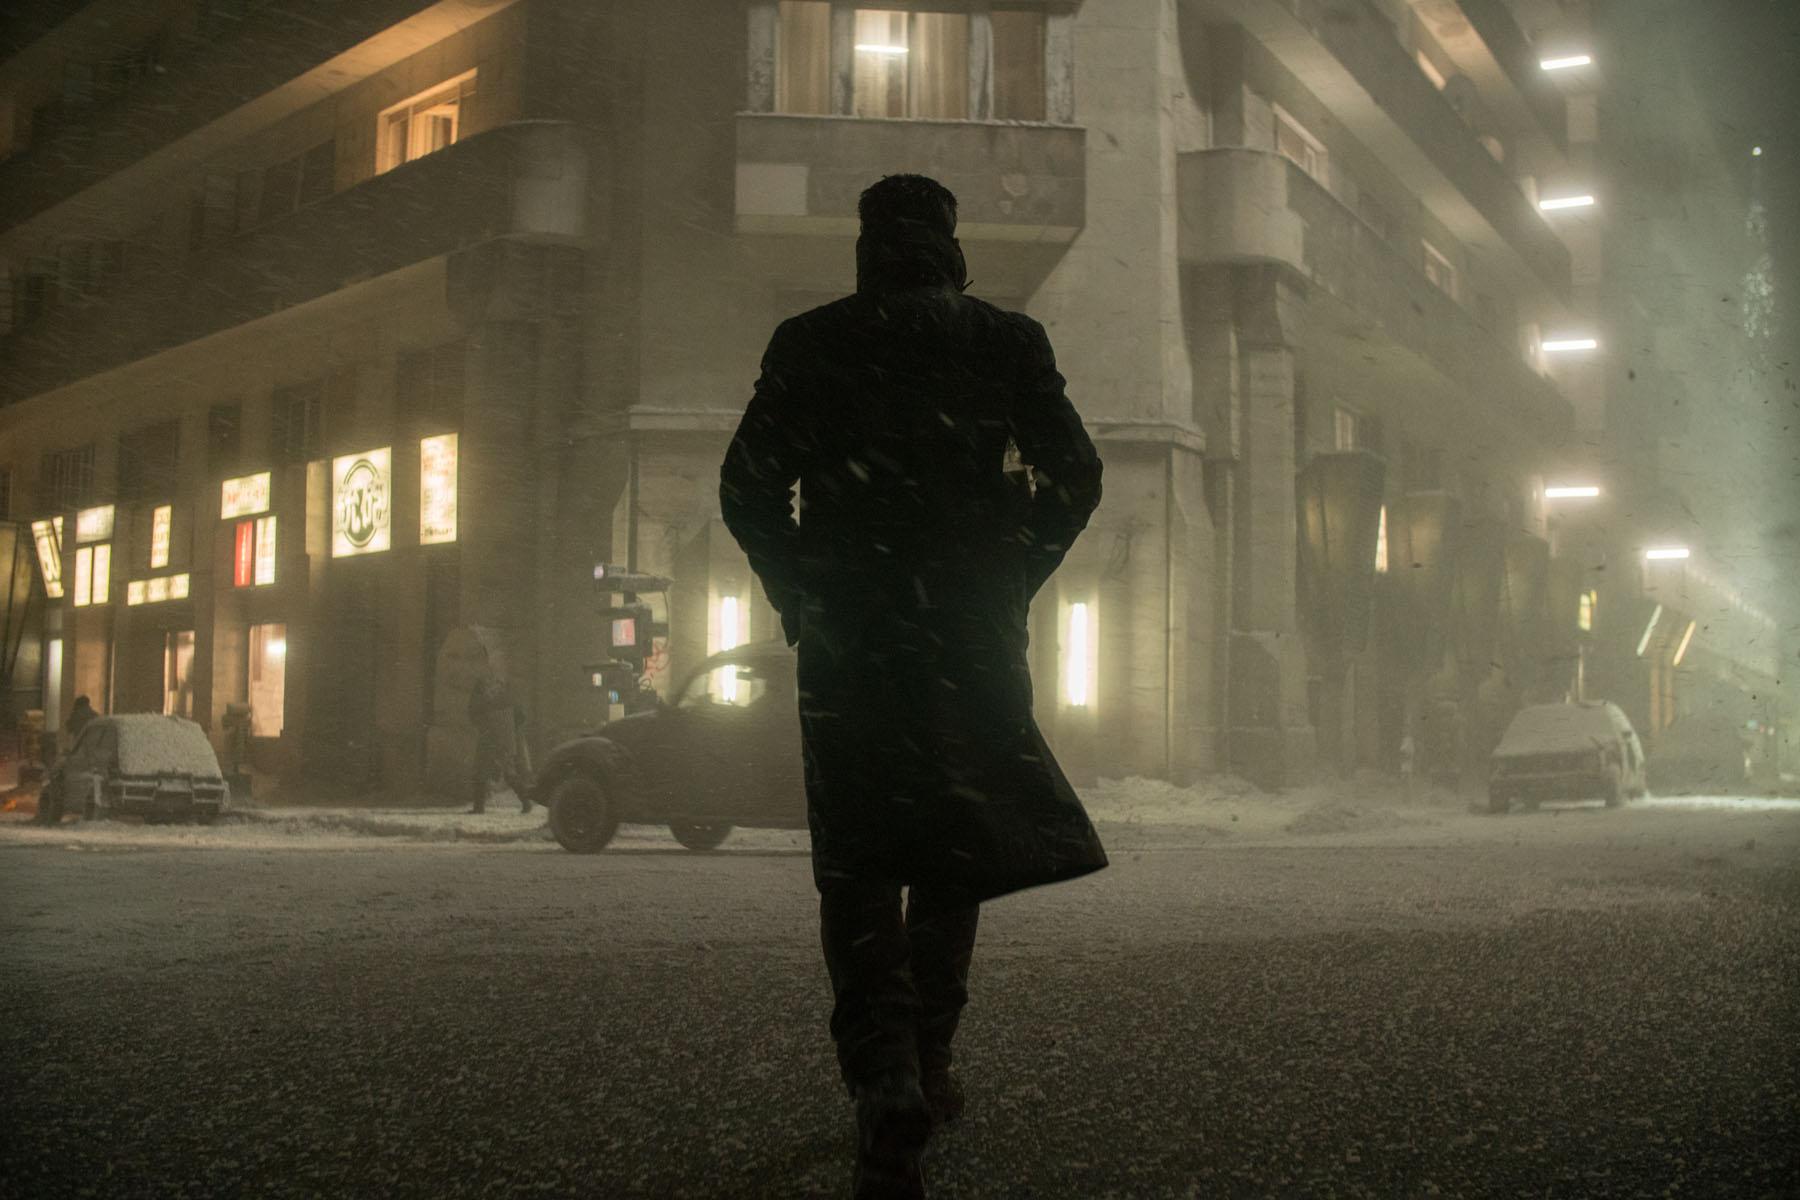 Denis Villeneuve's Editor Looks Back at That Four-Hour 'Blade Runner 2049' Cut, Teases How He's Approaching 'Dune'